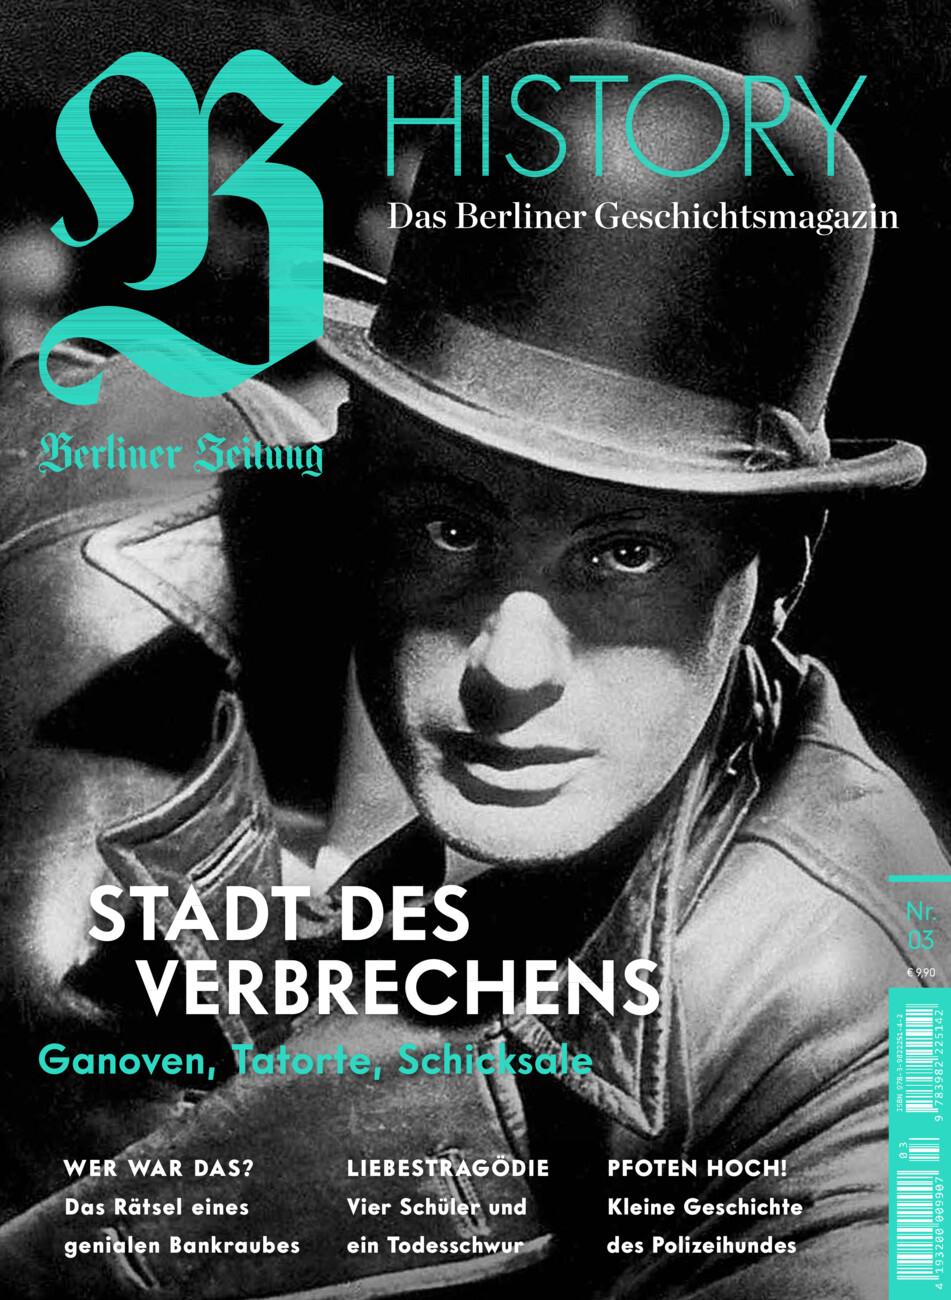 B-History German vom Donnerstag, 21.10.2021